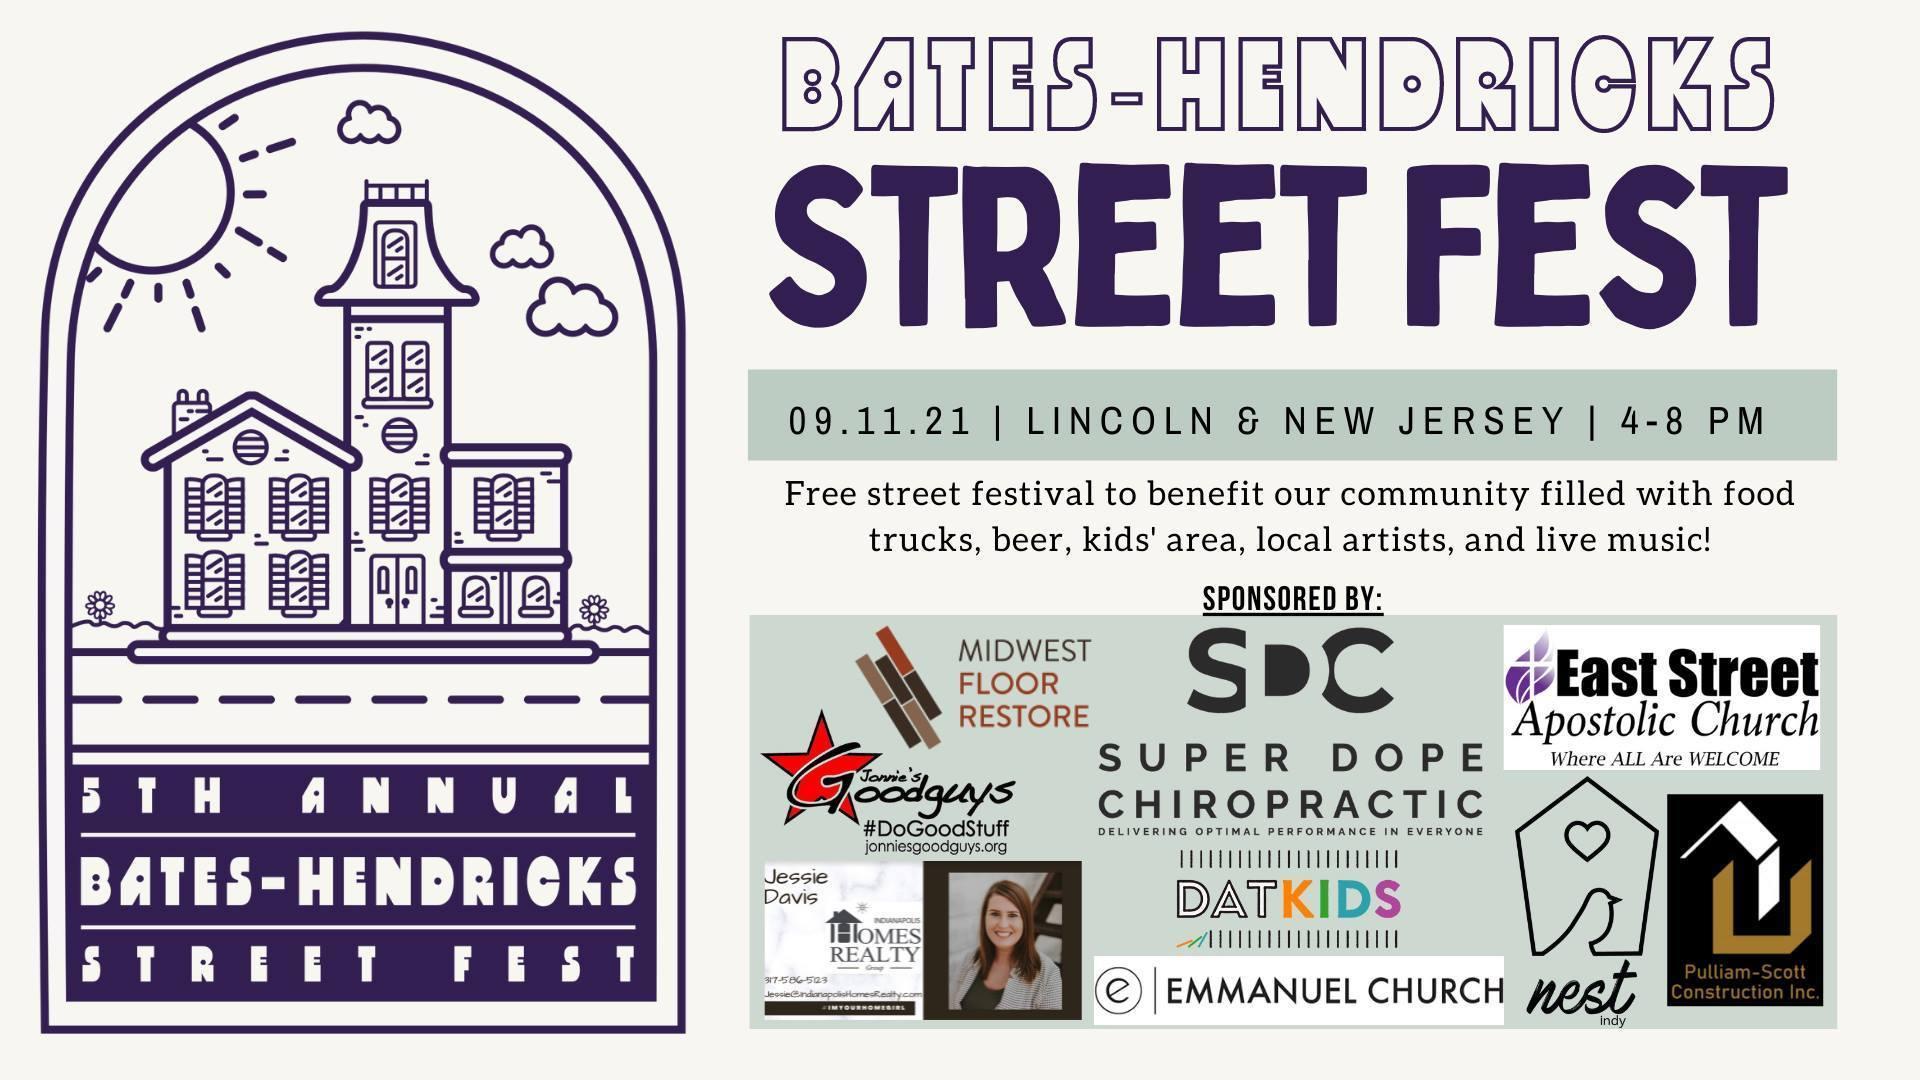 5th Annual Bates-Hendricks Street Fest